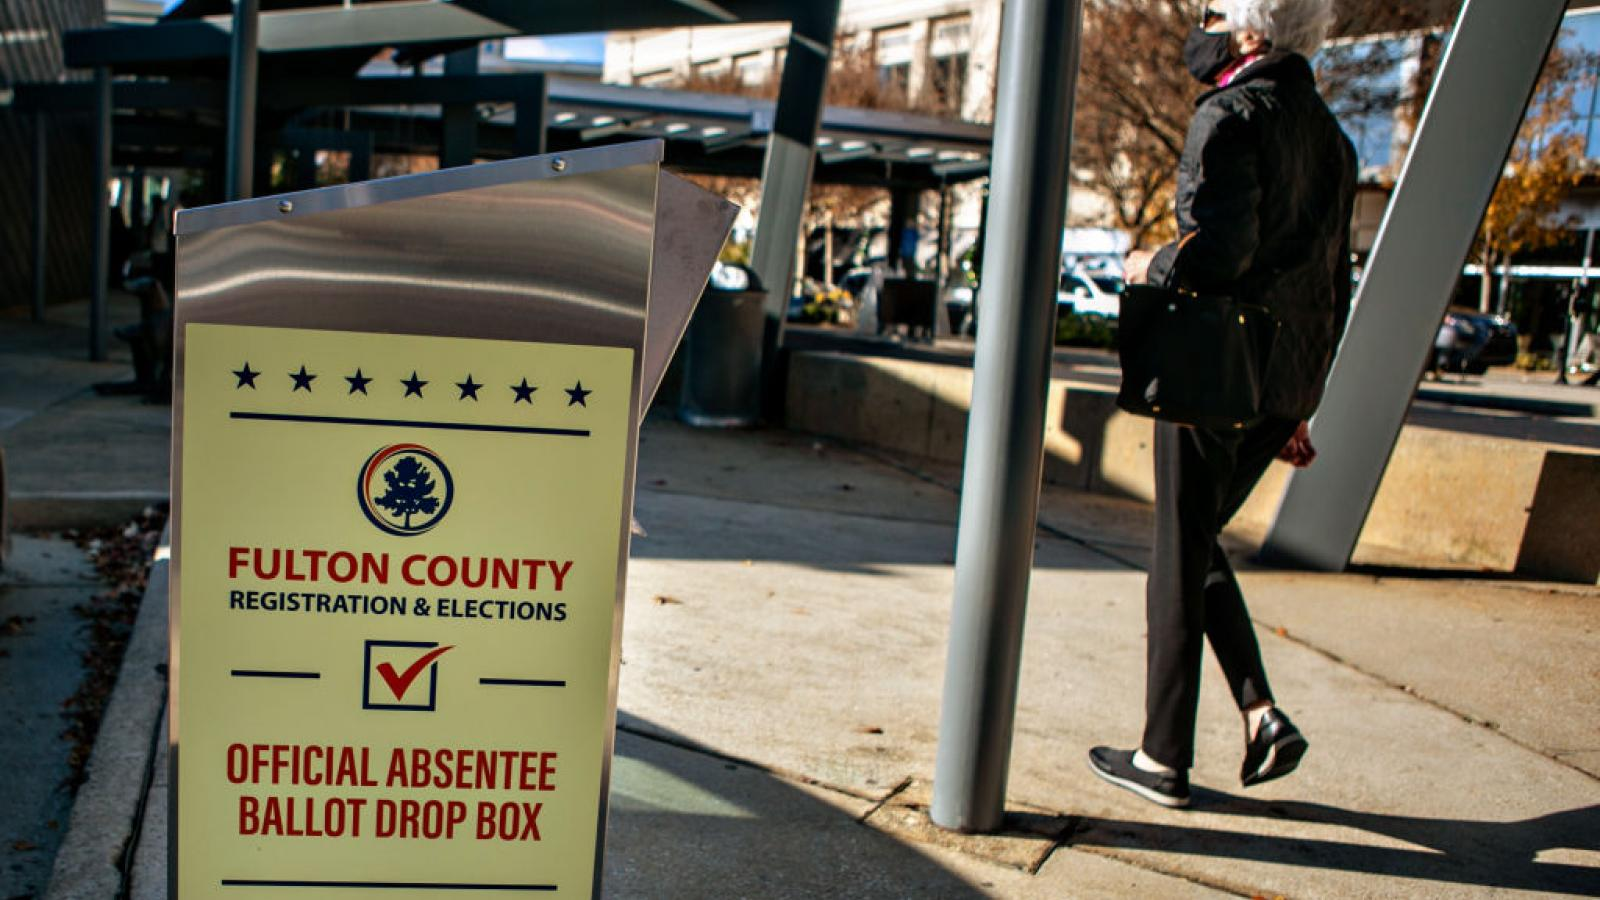 Fulton County voting location